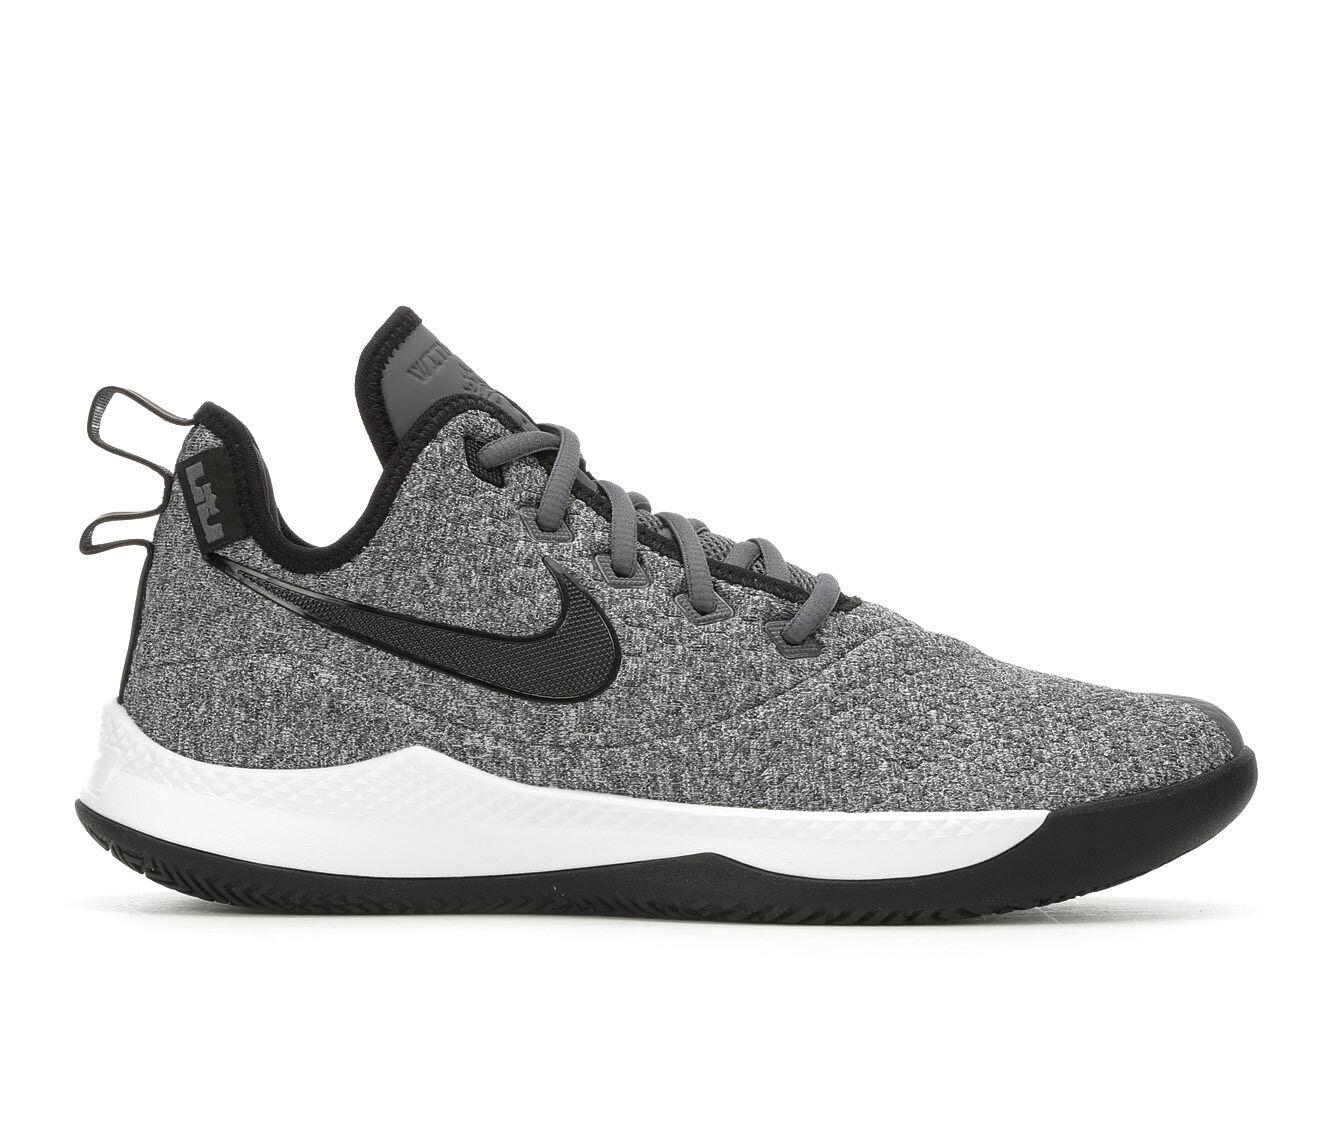 Men's Nike Lebron Witness III Basketball Shoes Gry/Blk 002